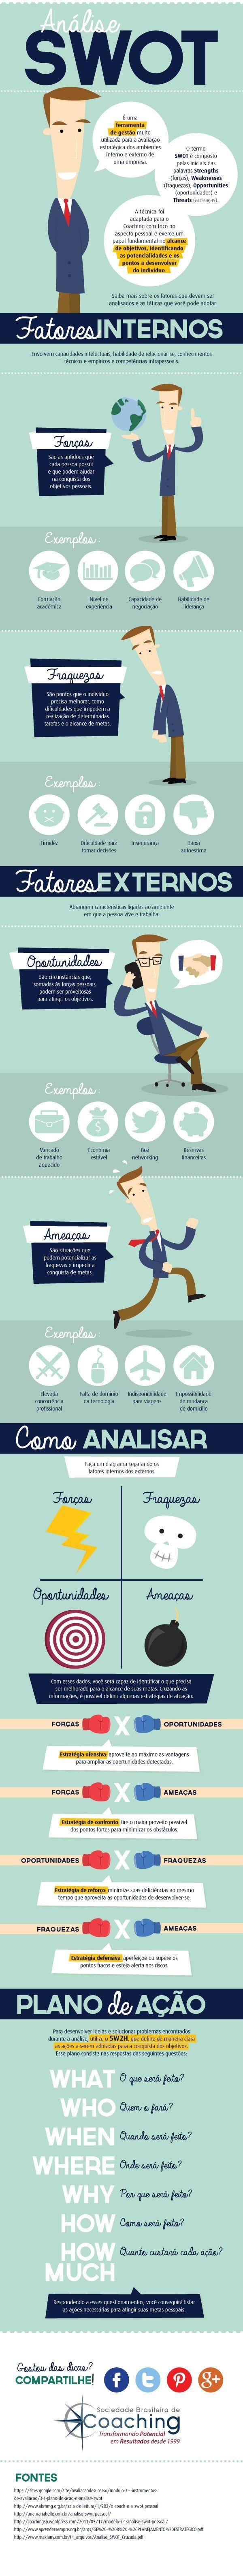 Análise SWOT - Infográfico SWOT